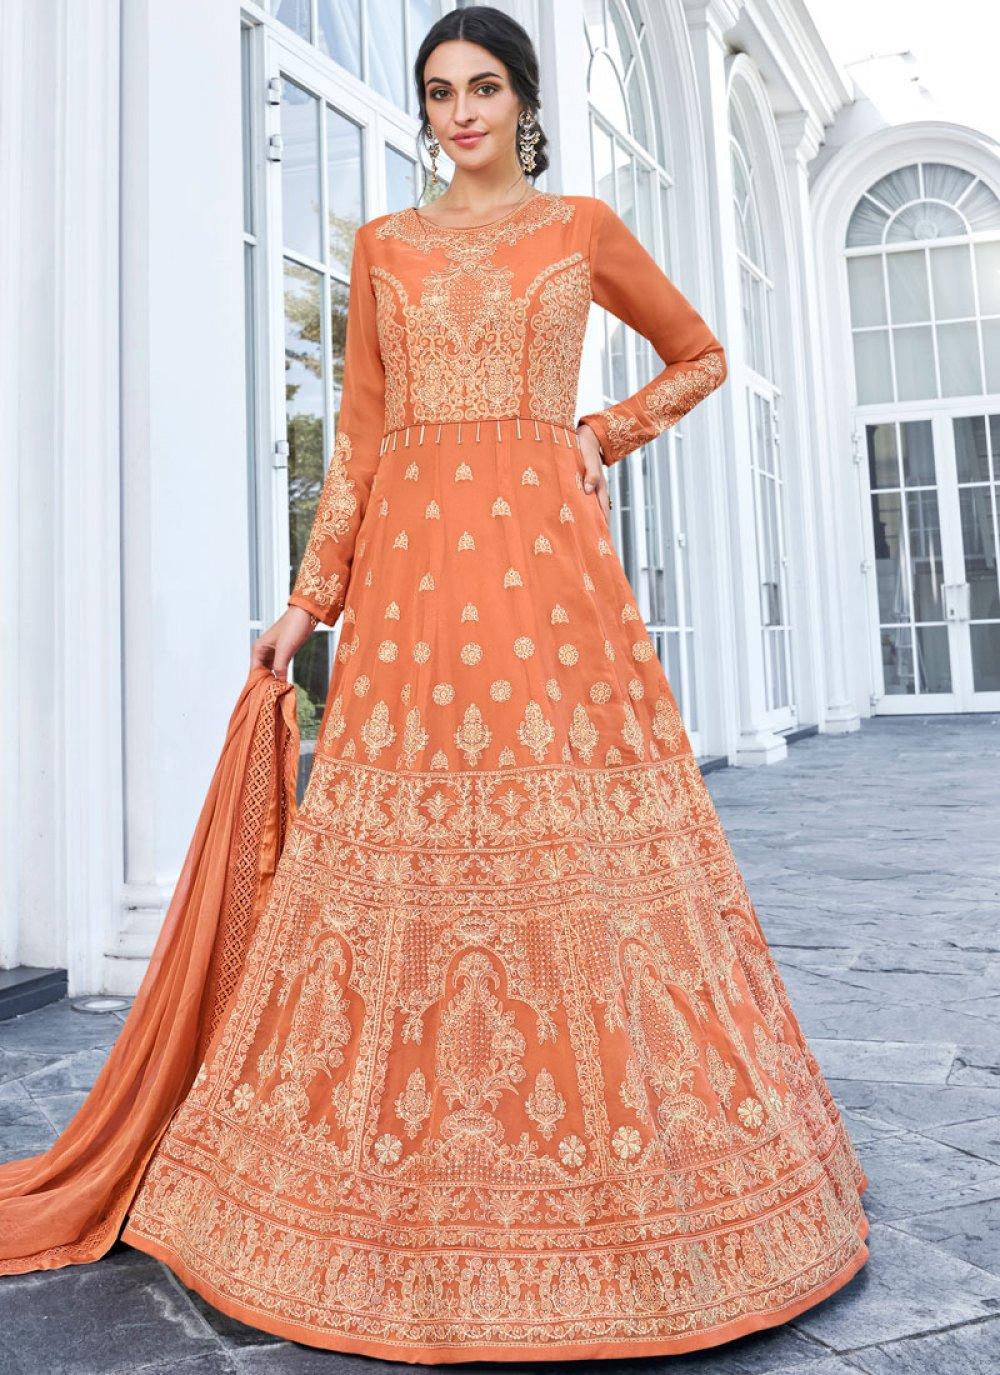 Faux Georgette Orange Floor Length Anarkali Salwar Suit